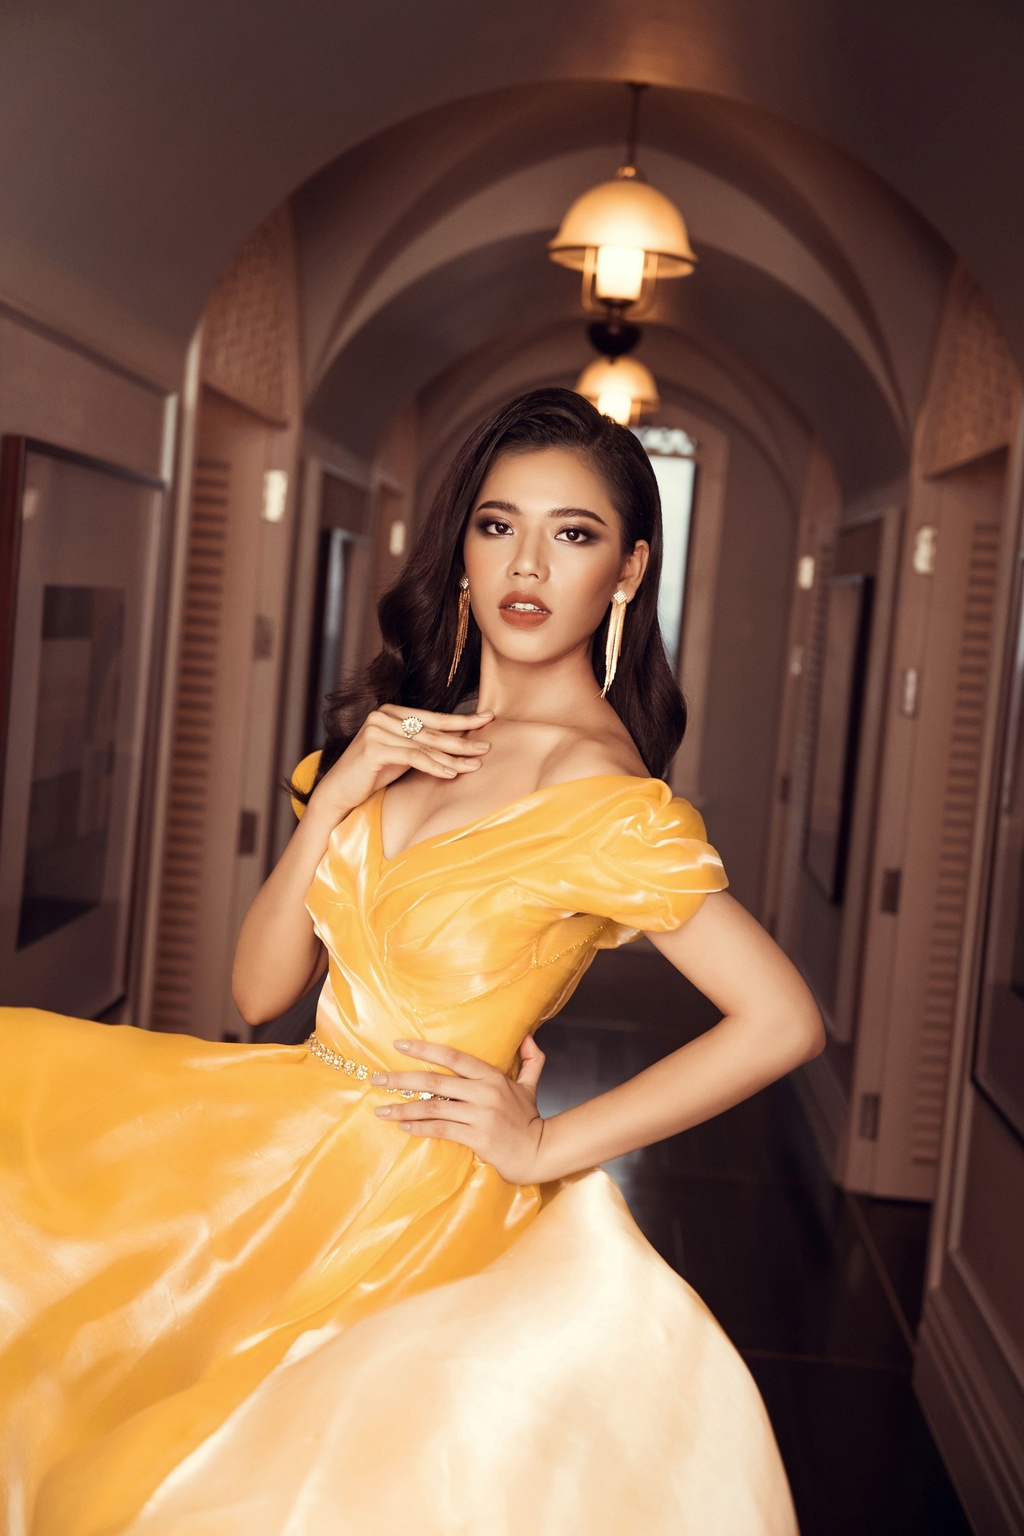 Top 45 Hoa hau Hoan vu Viet Nam khoe voc dang voi dam da hoi hinh anh 8